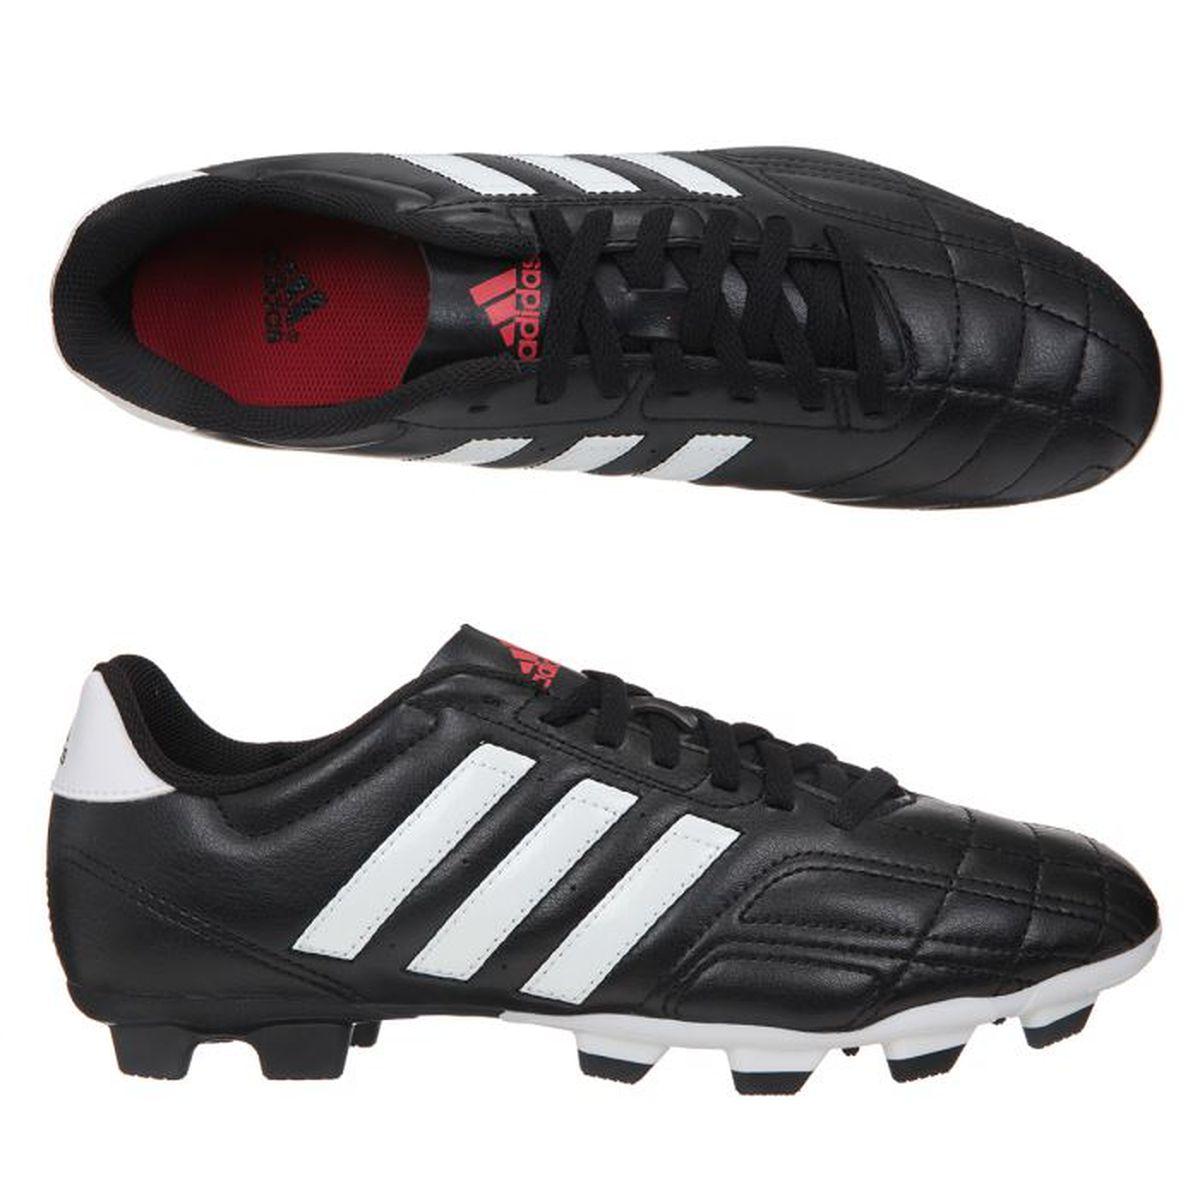 the best attitude 8d3eb 58143 CHAUSSURES DE FOOTBALL ADIDAS Chaussures Football Goletto IV TRX FG Terra